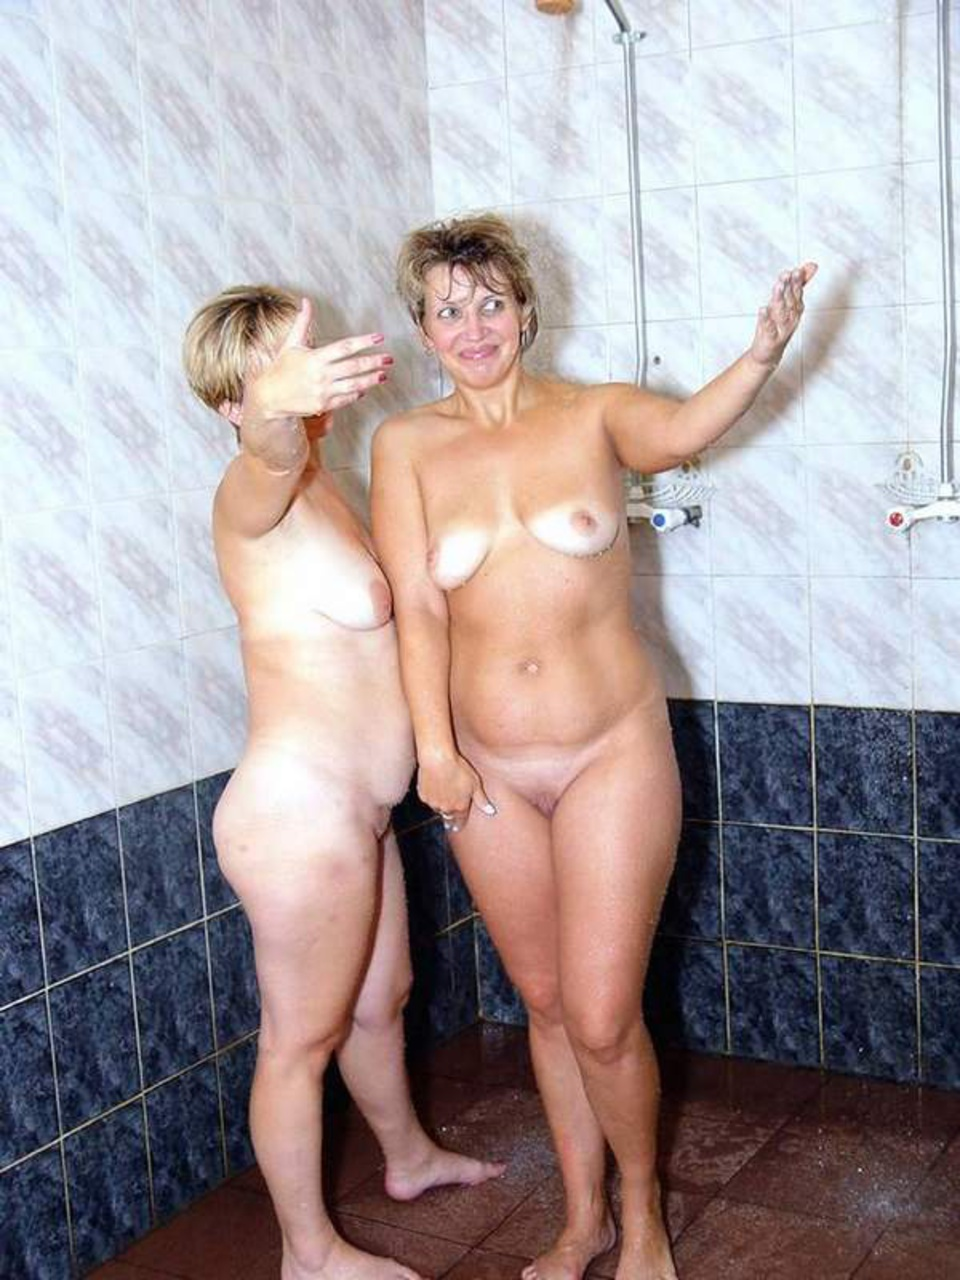 Банный секс со зрелыми